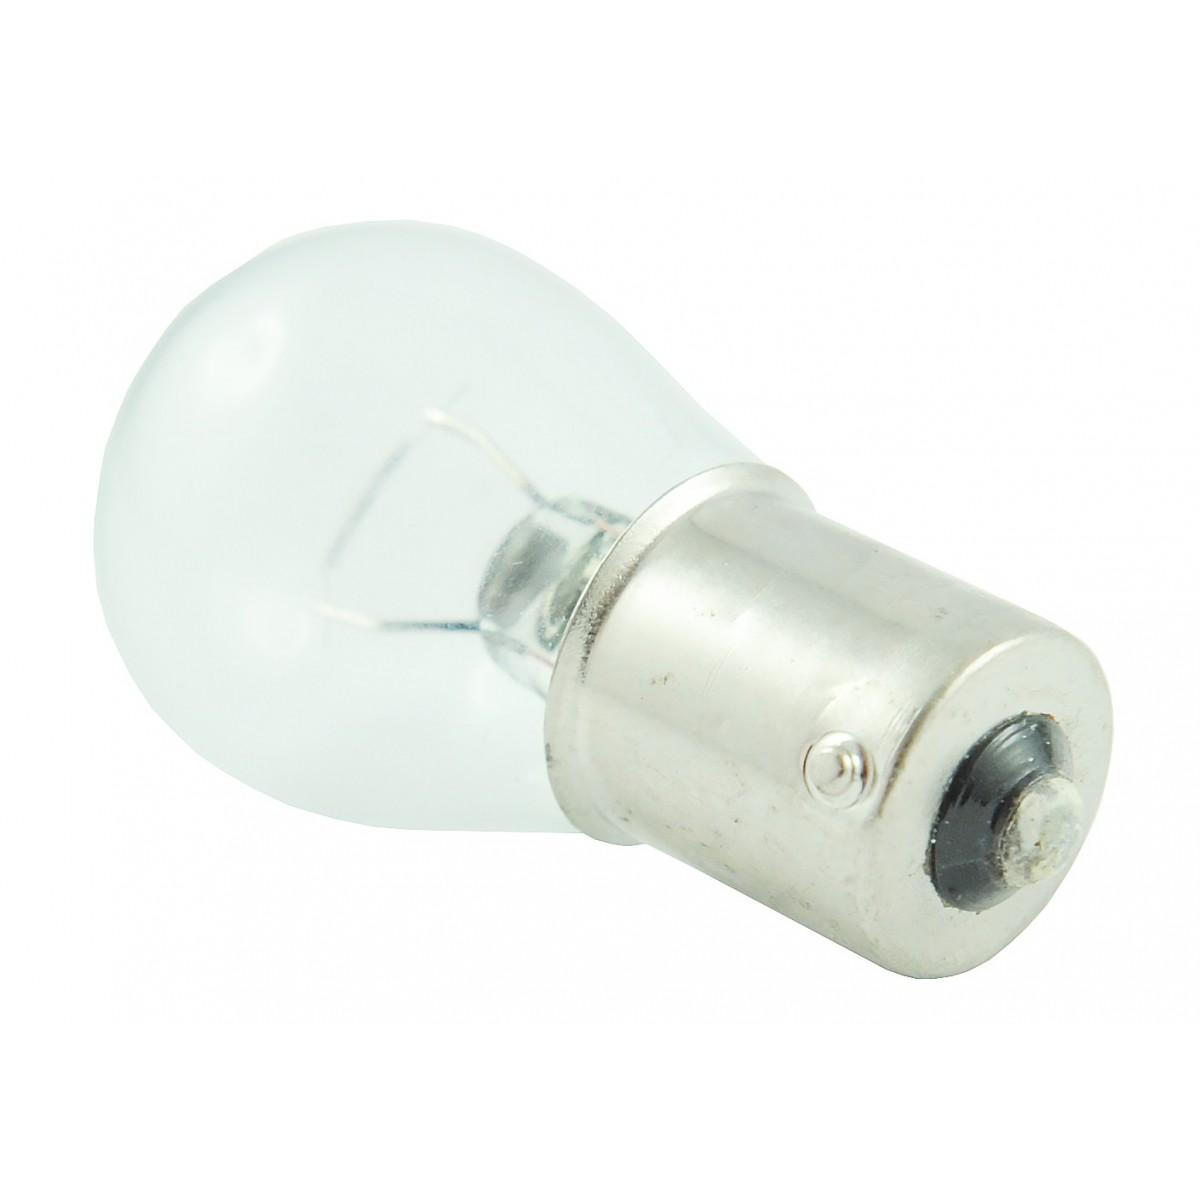 Glühbirne 12V P21W eine Ref-Faser. 1016 Kubota